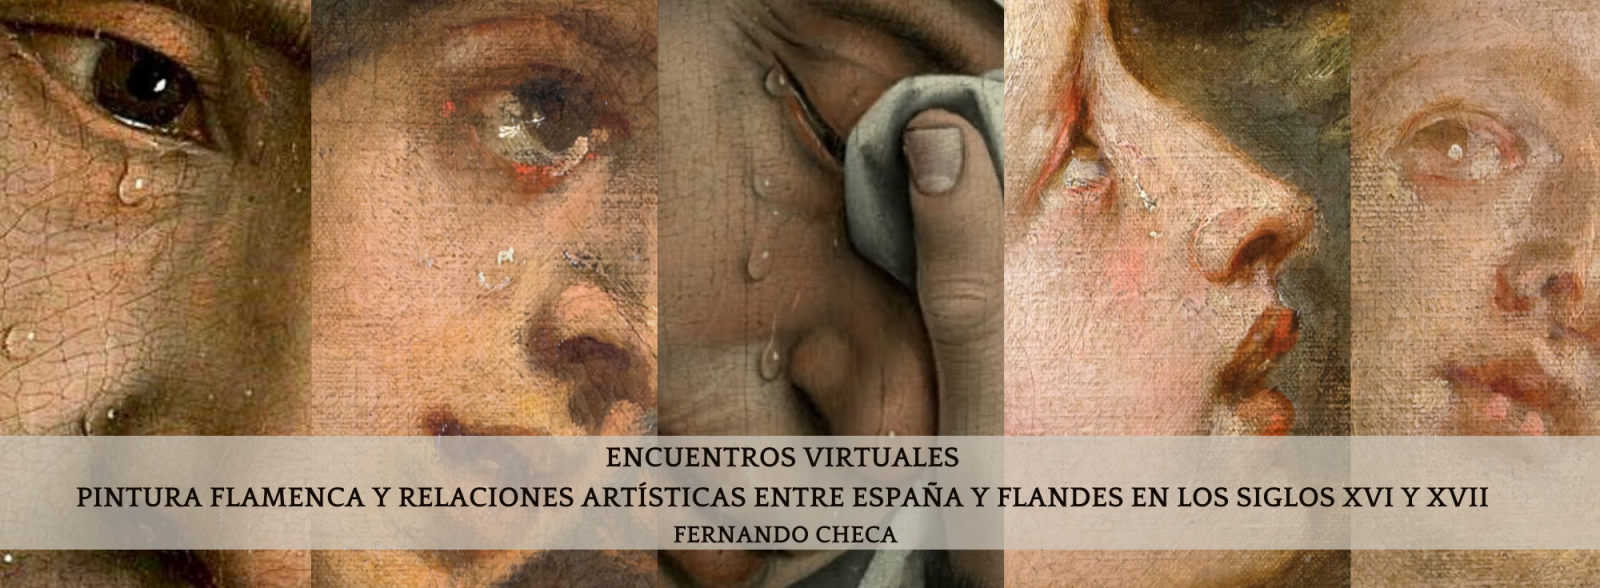 Curso Fernando Checa - Pintura Flamenca